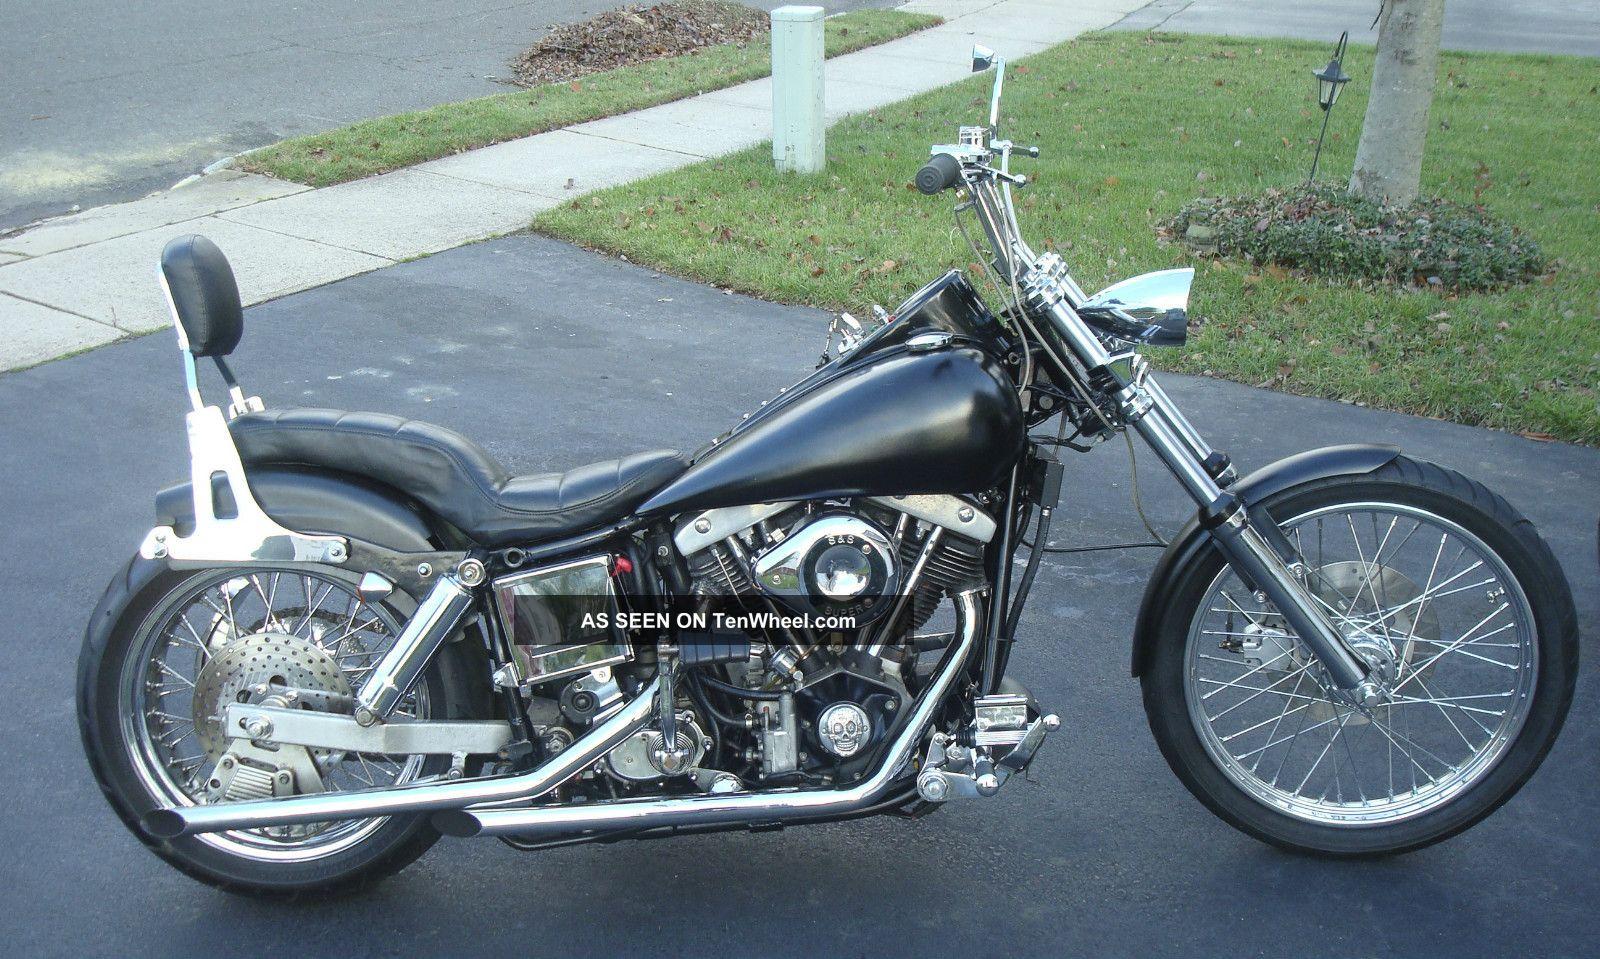 1984 Flh Wiring   Wiring Diagram Harley Electra Glide Wiring Diagram on